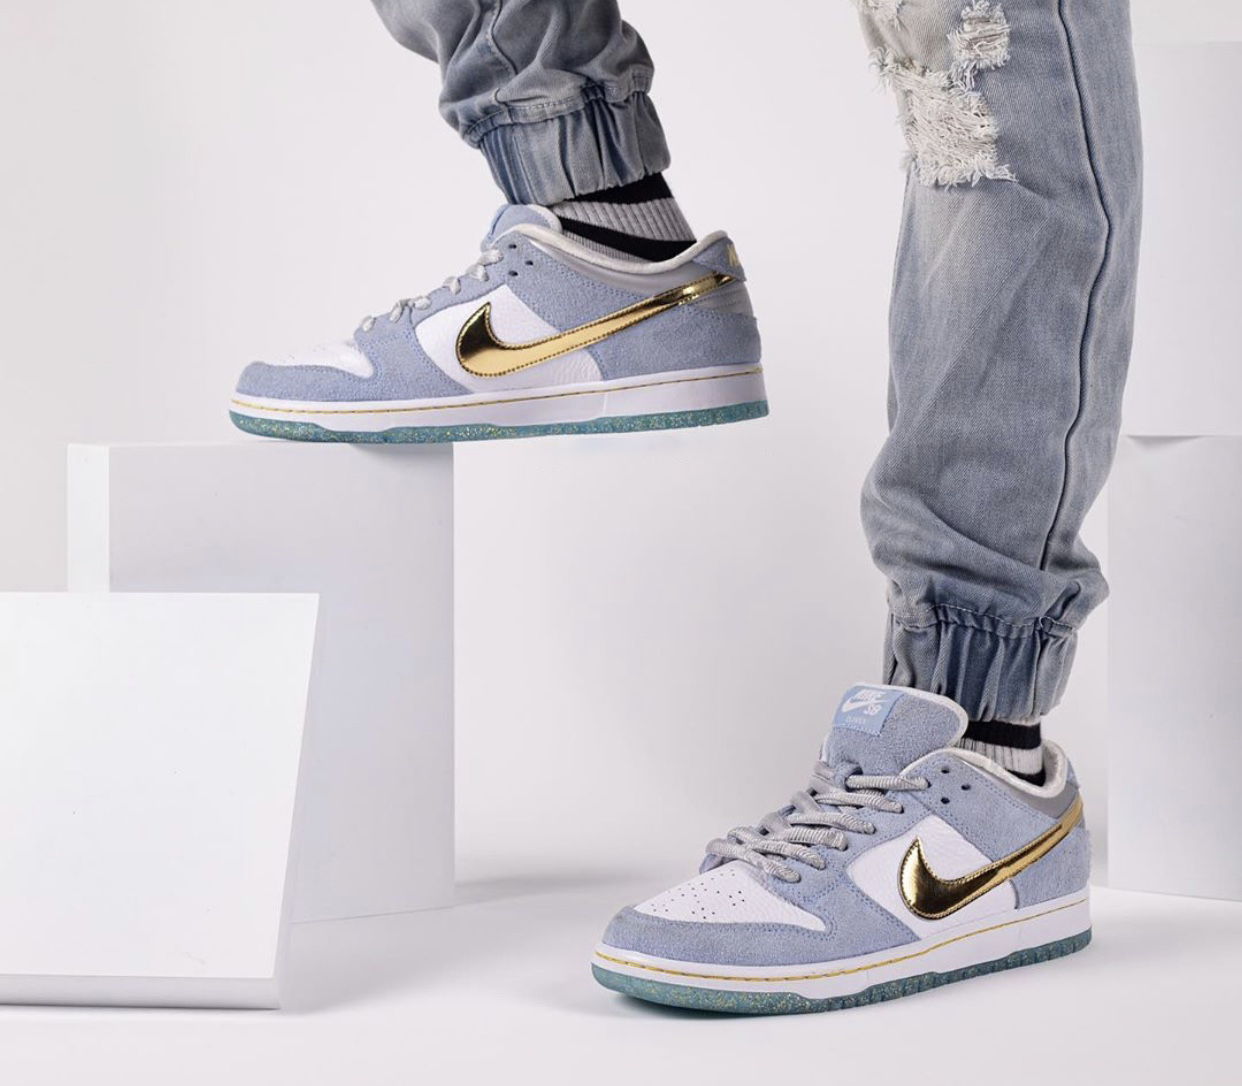 Sean-Cliver-Nike-SB-Dunk-Low-DC9936-100-wearing7